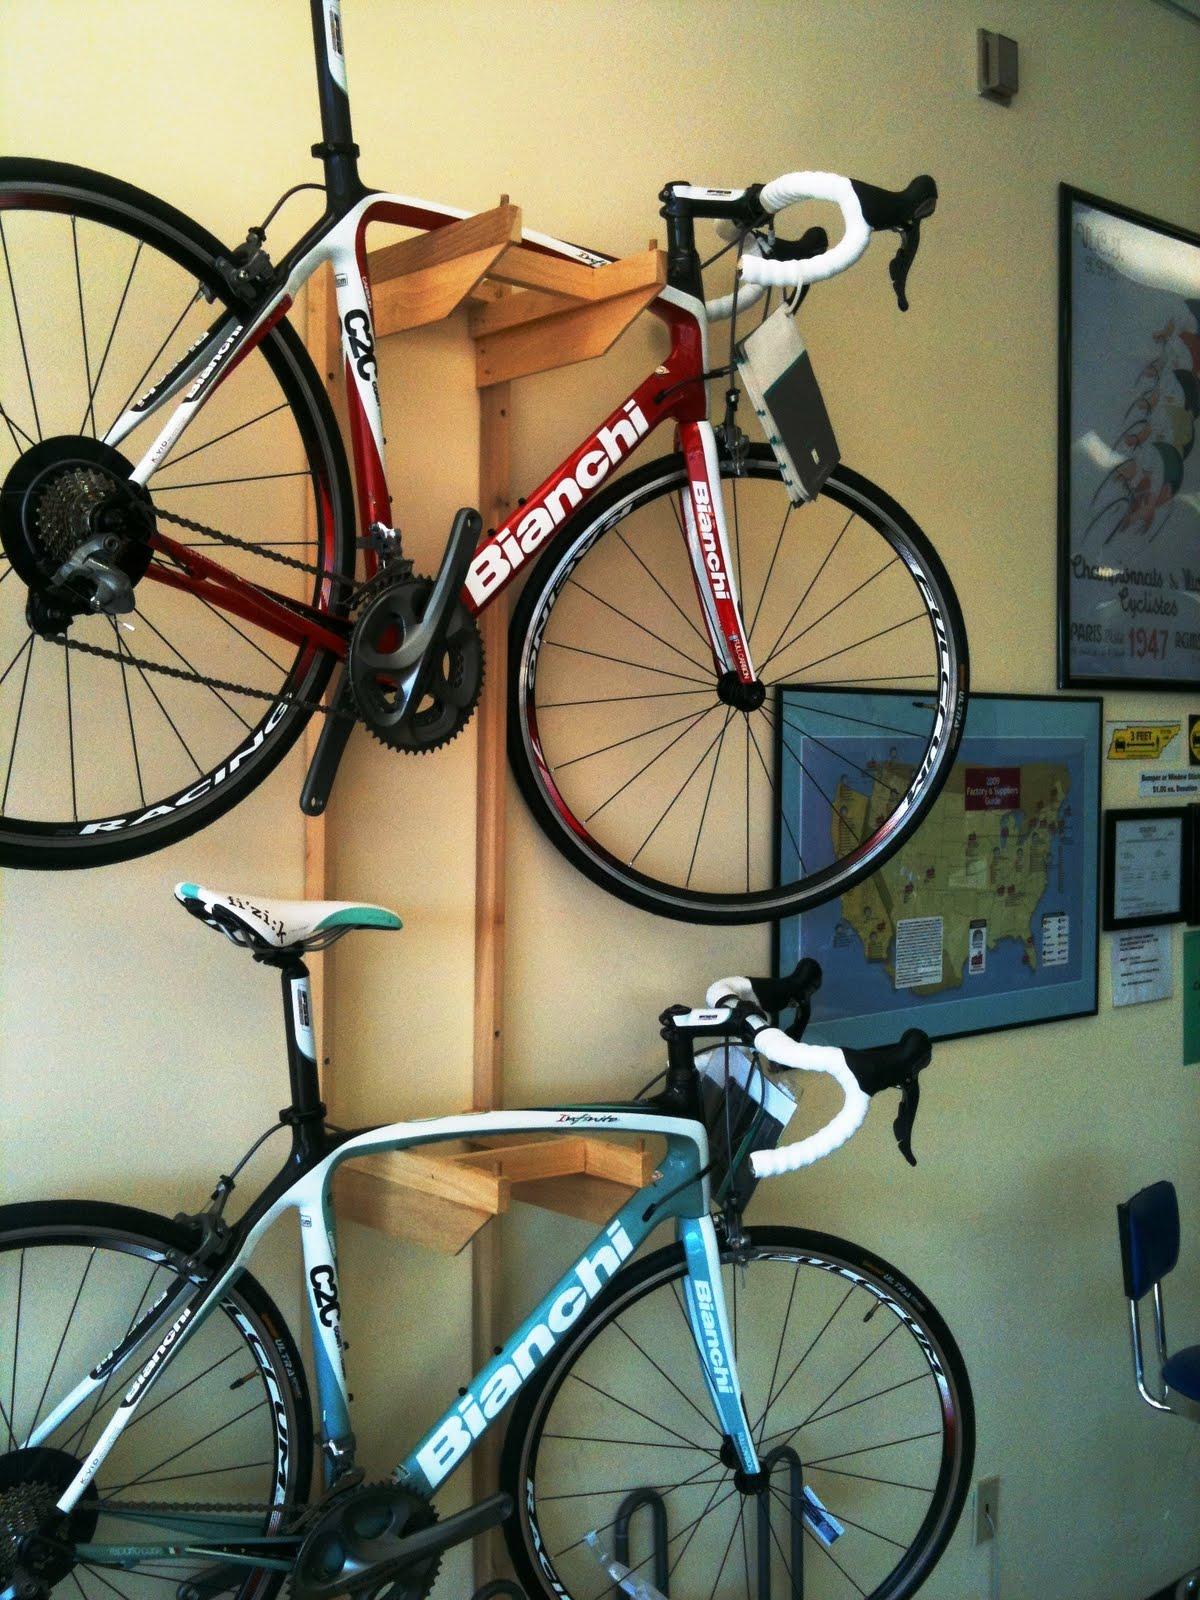 Bianchi Bikes Charlotte Nc road bike